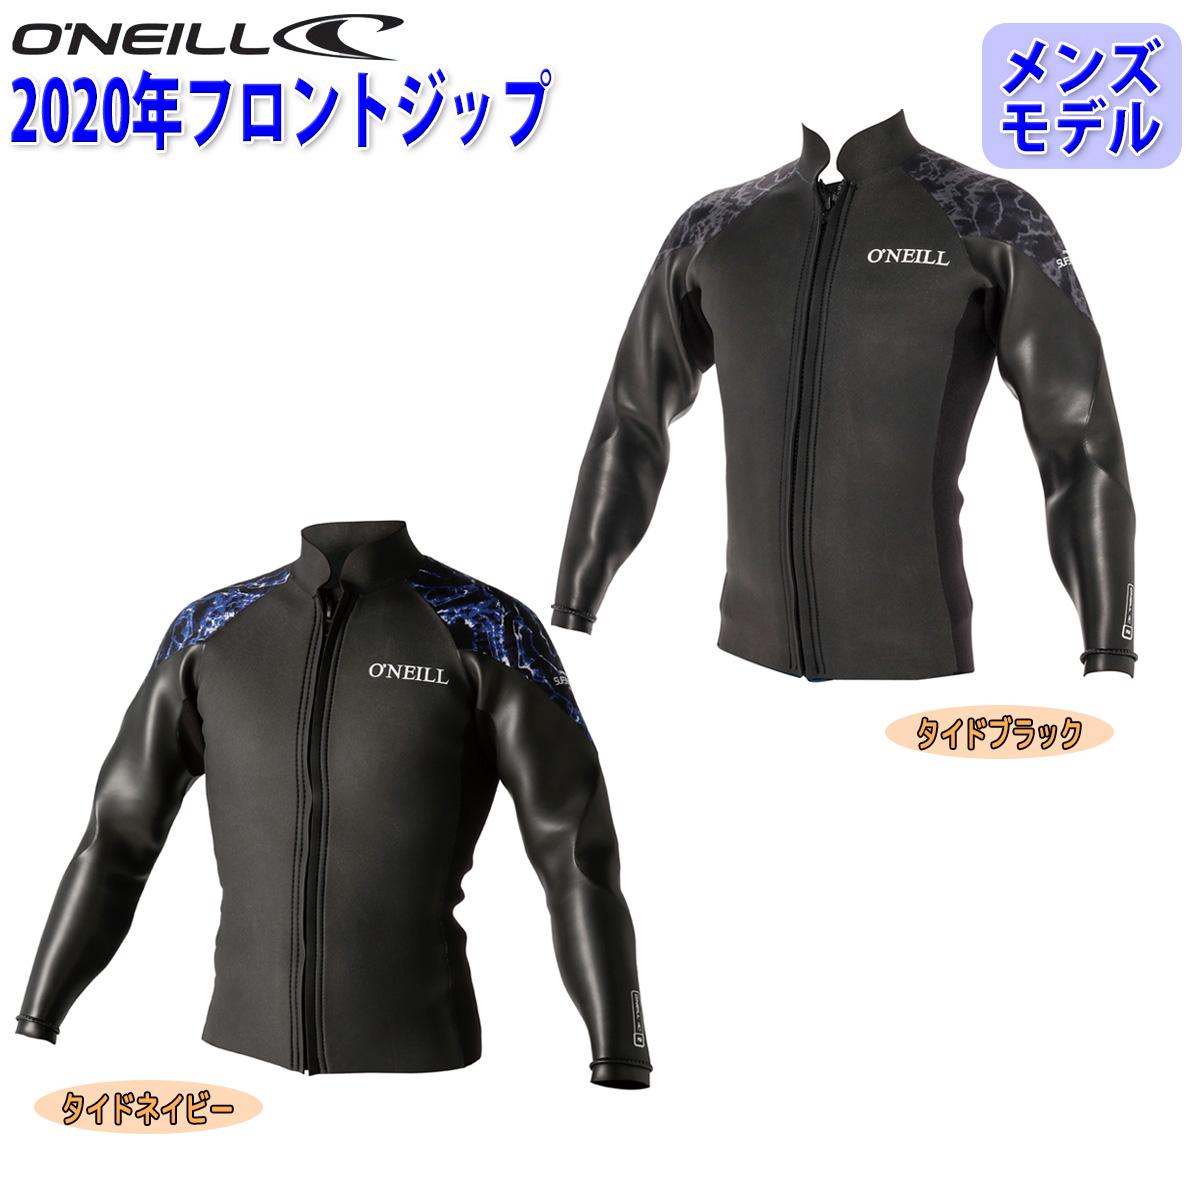 20 O'NEILL オニール WIND長袖タッパー ウェットスーツ ウエットスーツ フロントジップ バリュー 春夏用 メンズモデル 2020年 WINDSUPERFREAK ウインドスーパーフリーク品番 WF-3590 日本正規品